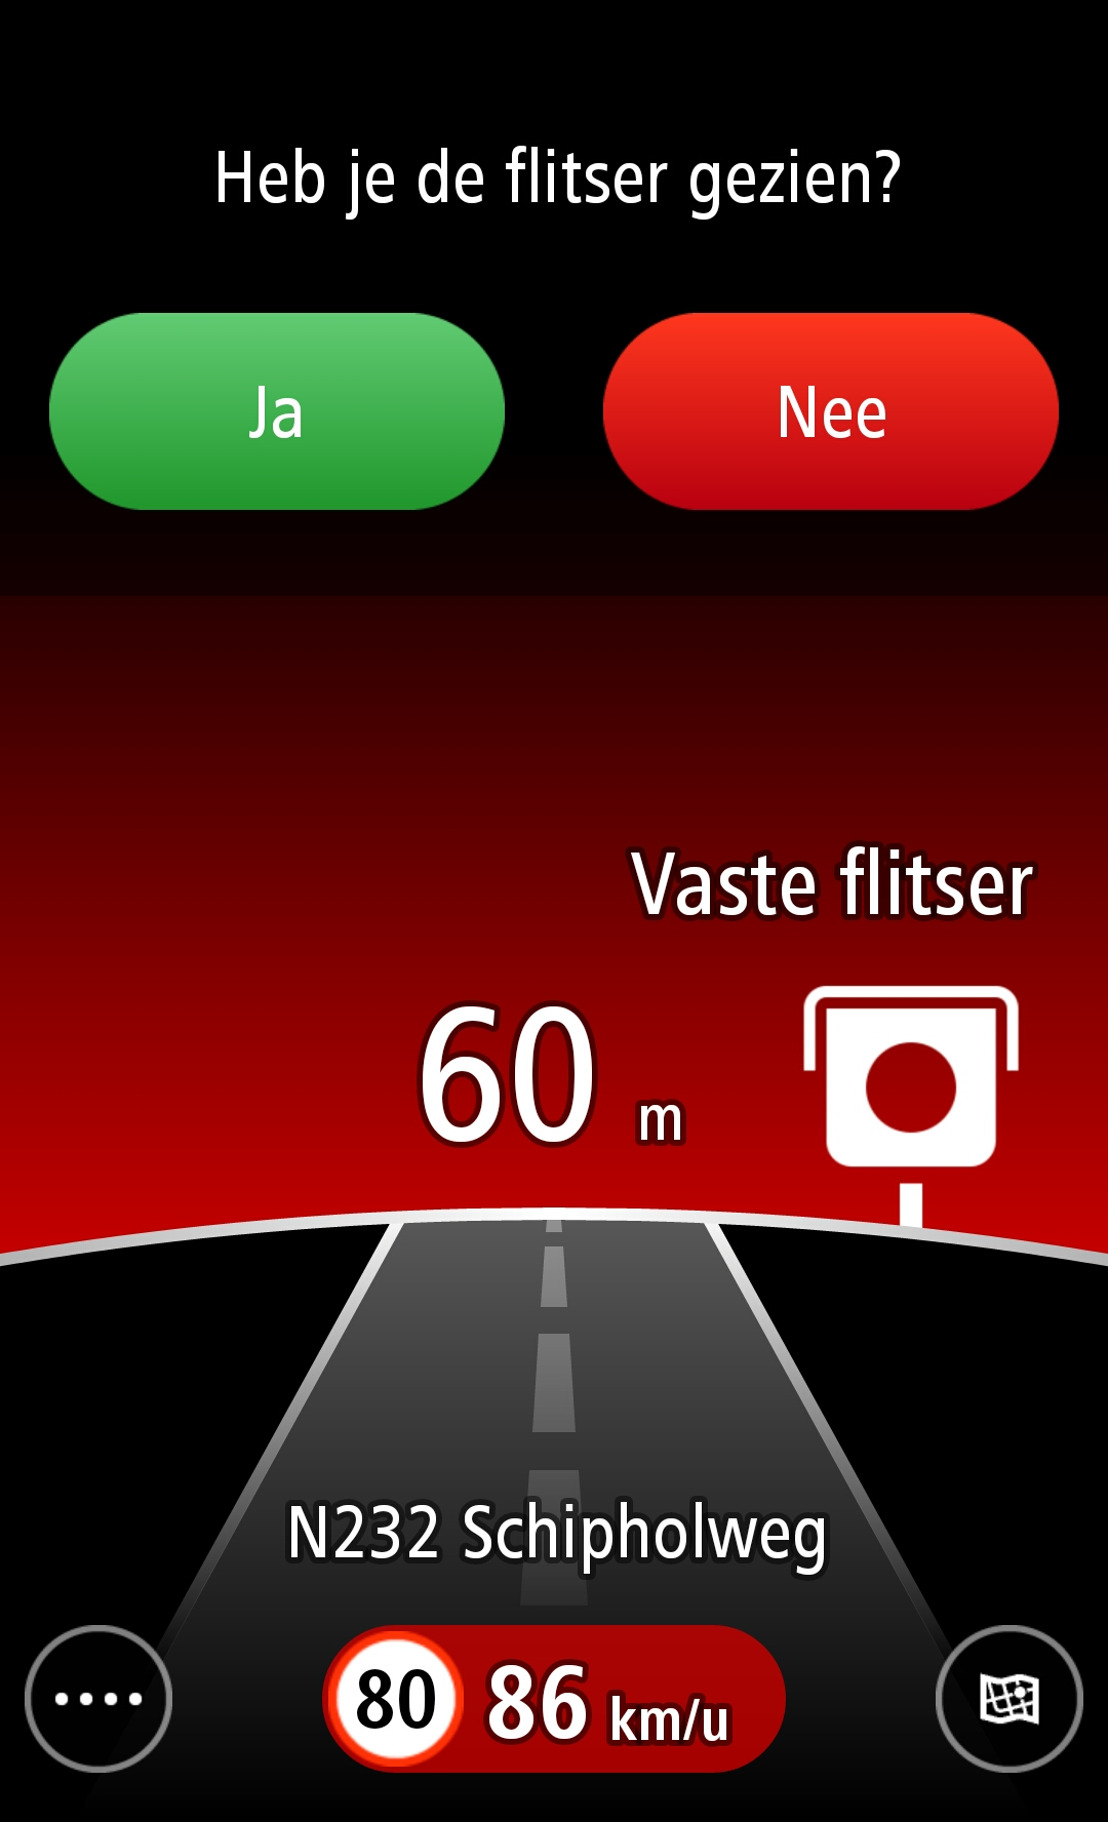 TomTom Flitsers app vanaf vandaag beschikbaar op Google Play